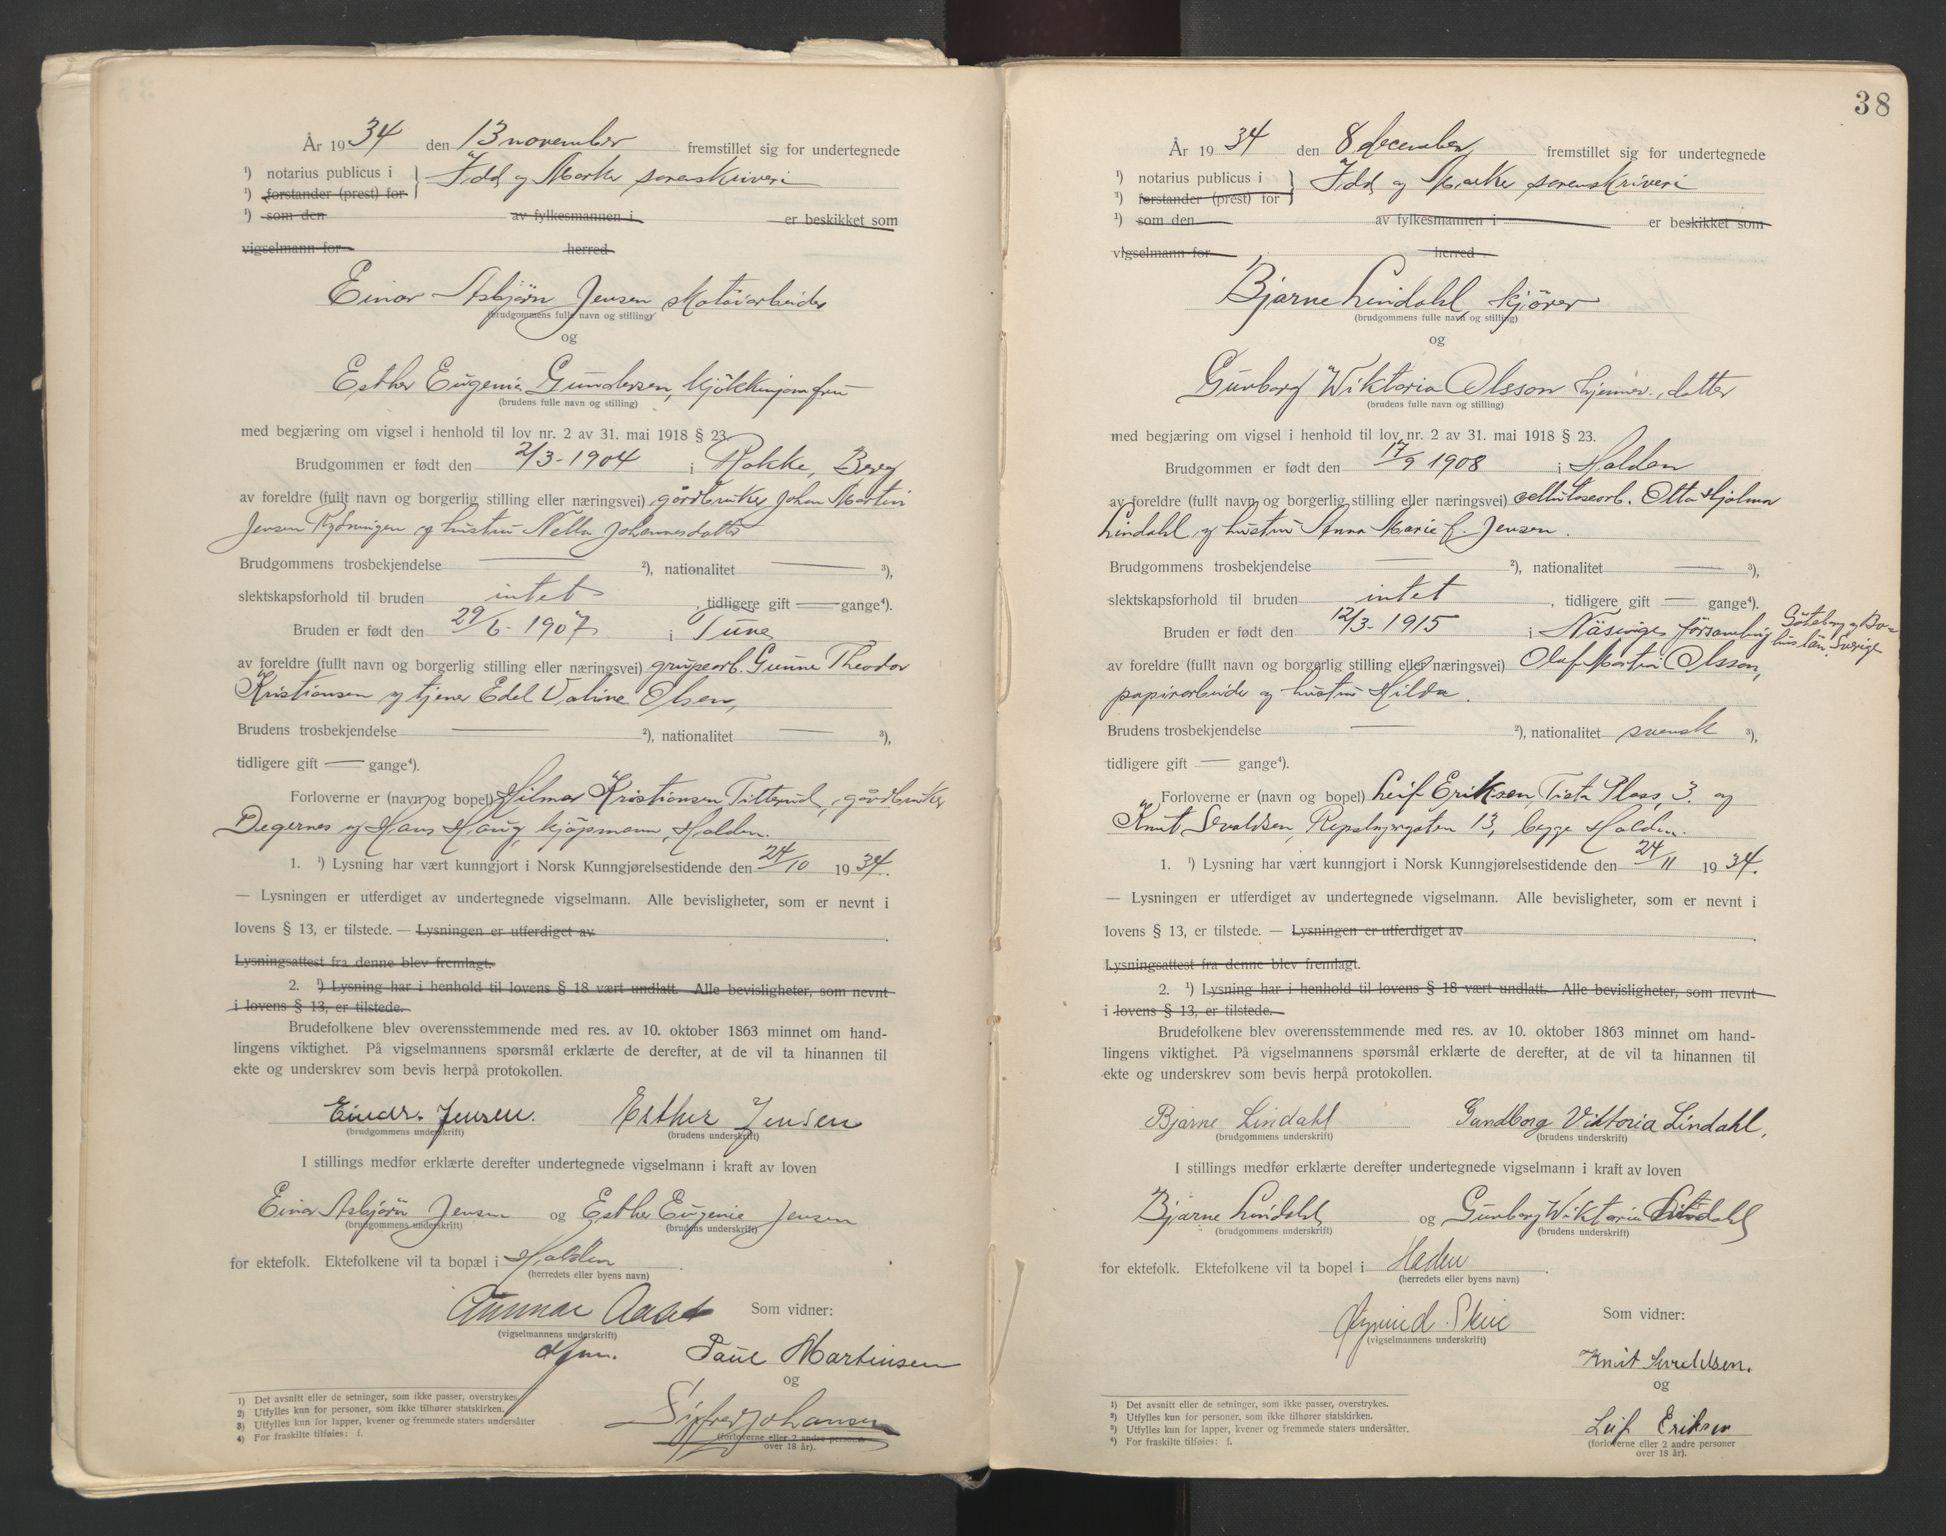 SAO, Idd og Marker sorenskriveri, L/Lc/L0001: Vigselsbøker, 1920-1942, s. 38